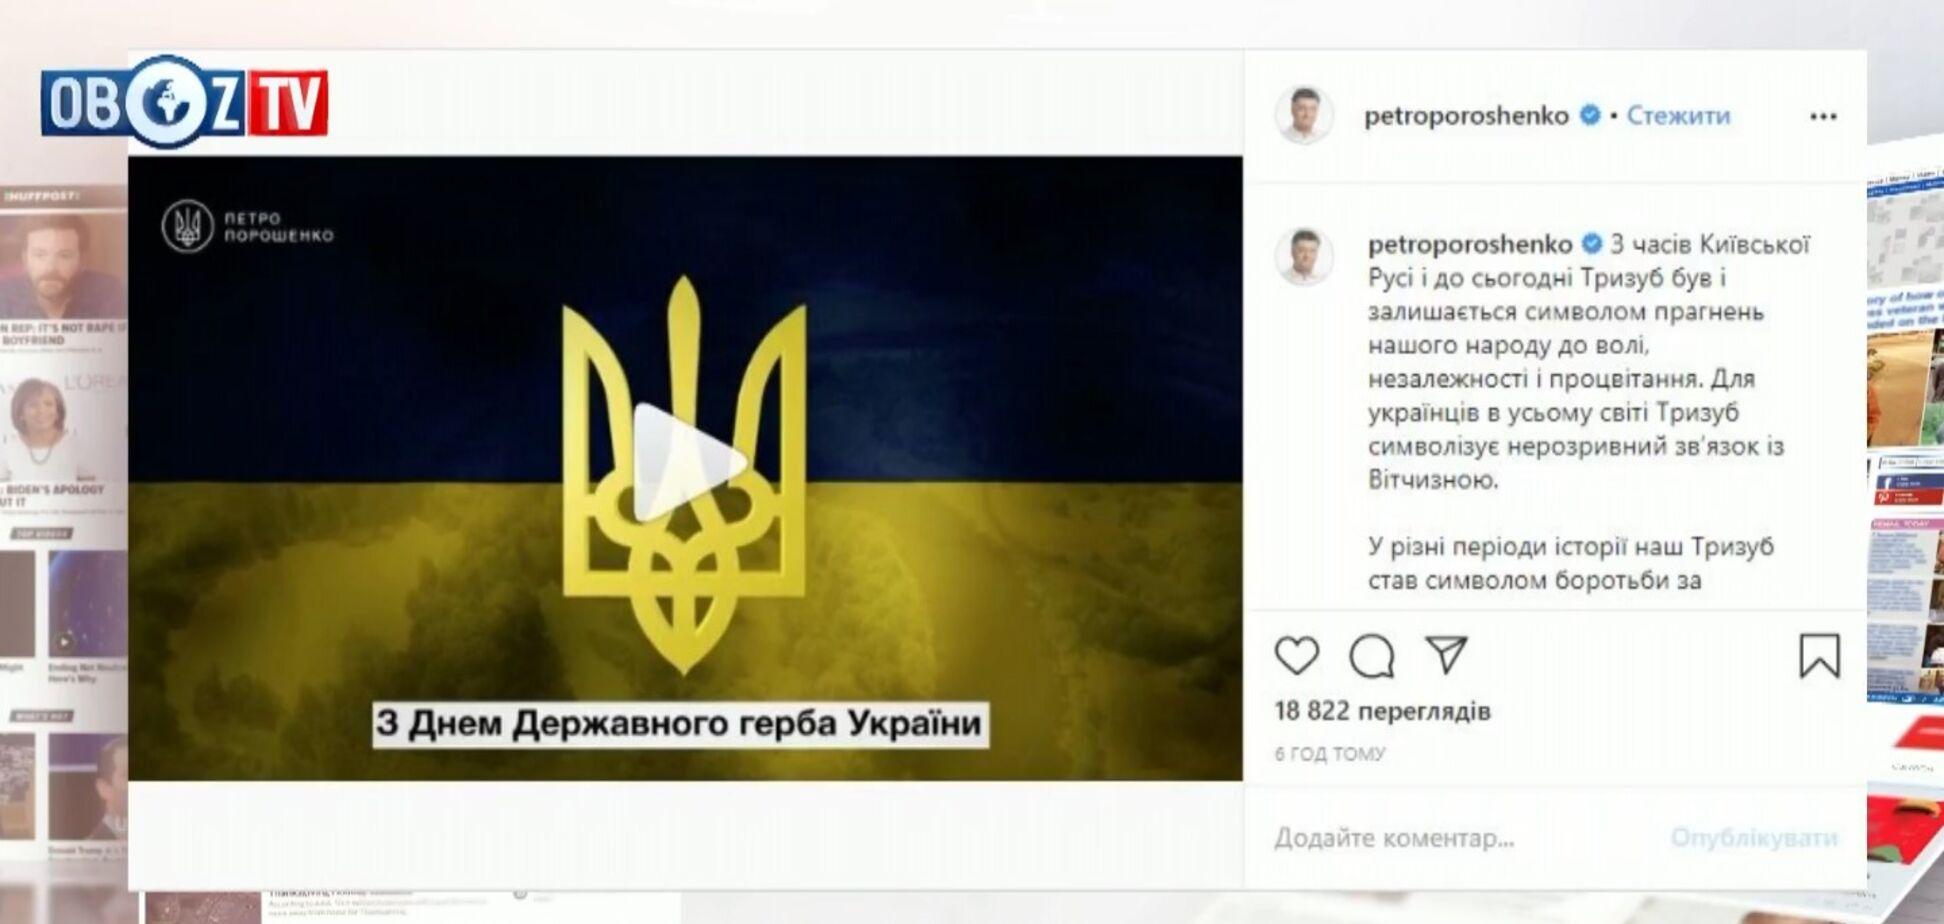 INSTAOBOZ: обзор Инстаграма политиков